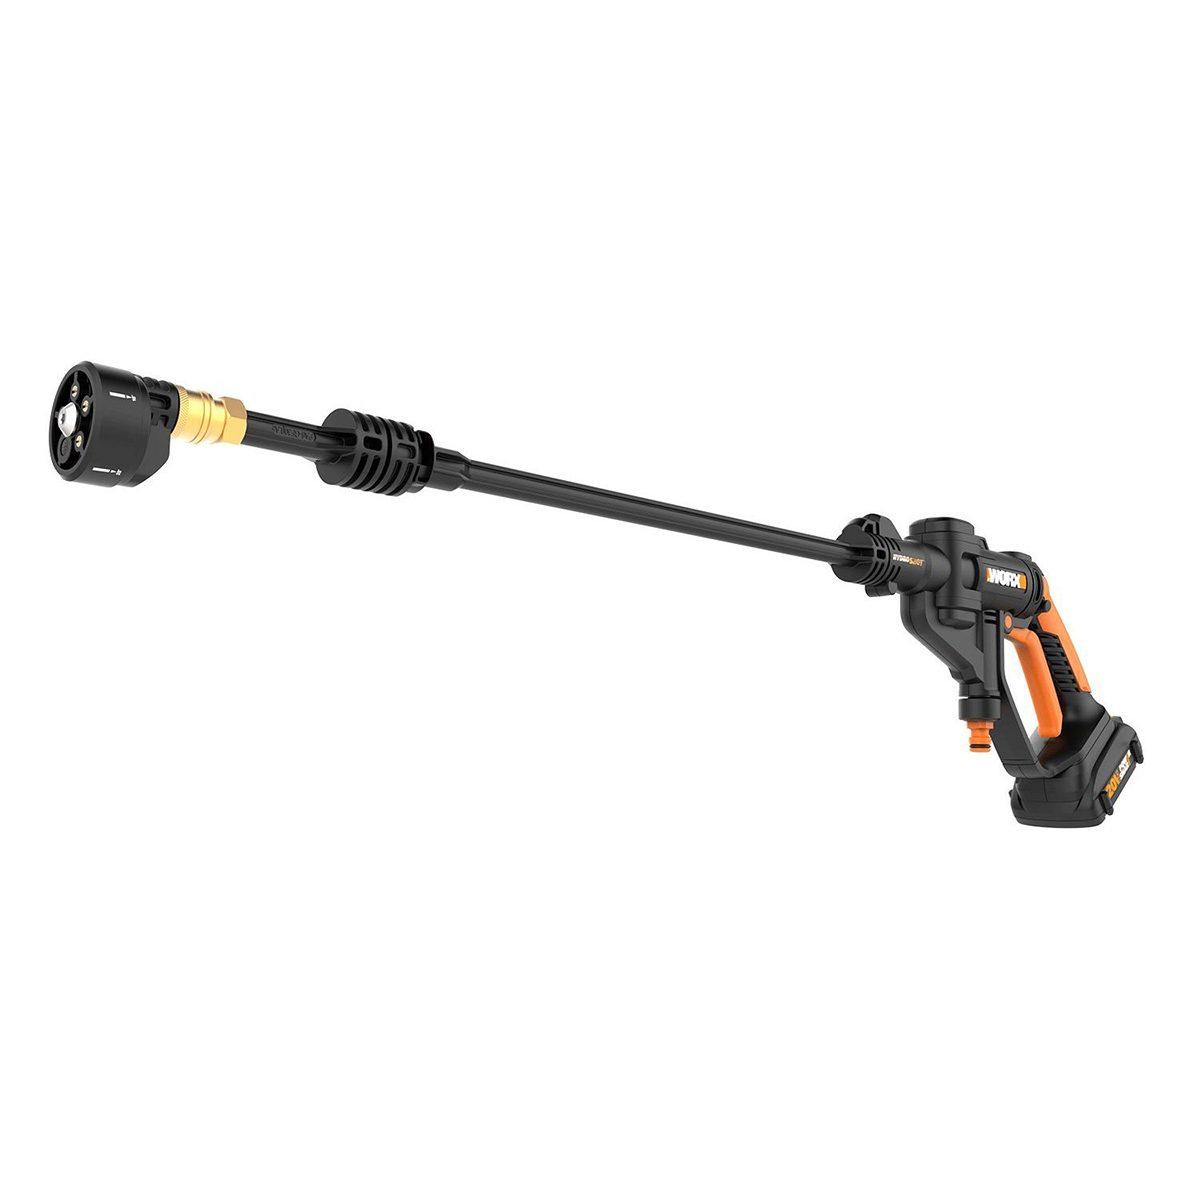 Worx Hydroshot Portable Power Cleaner